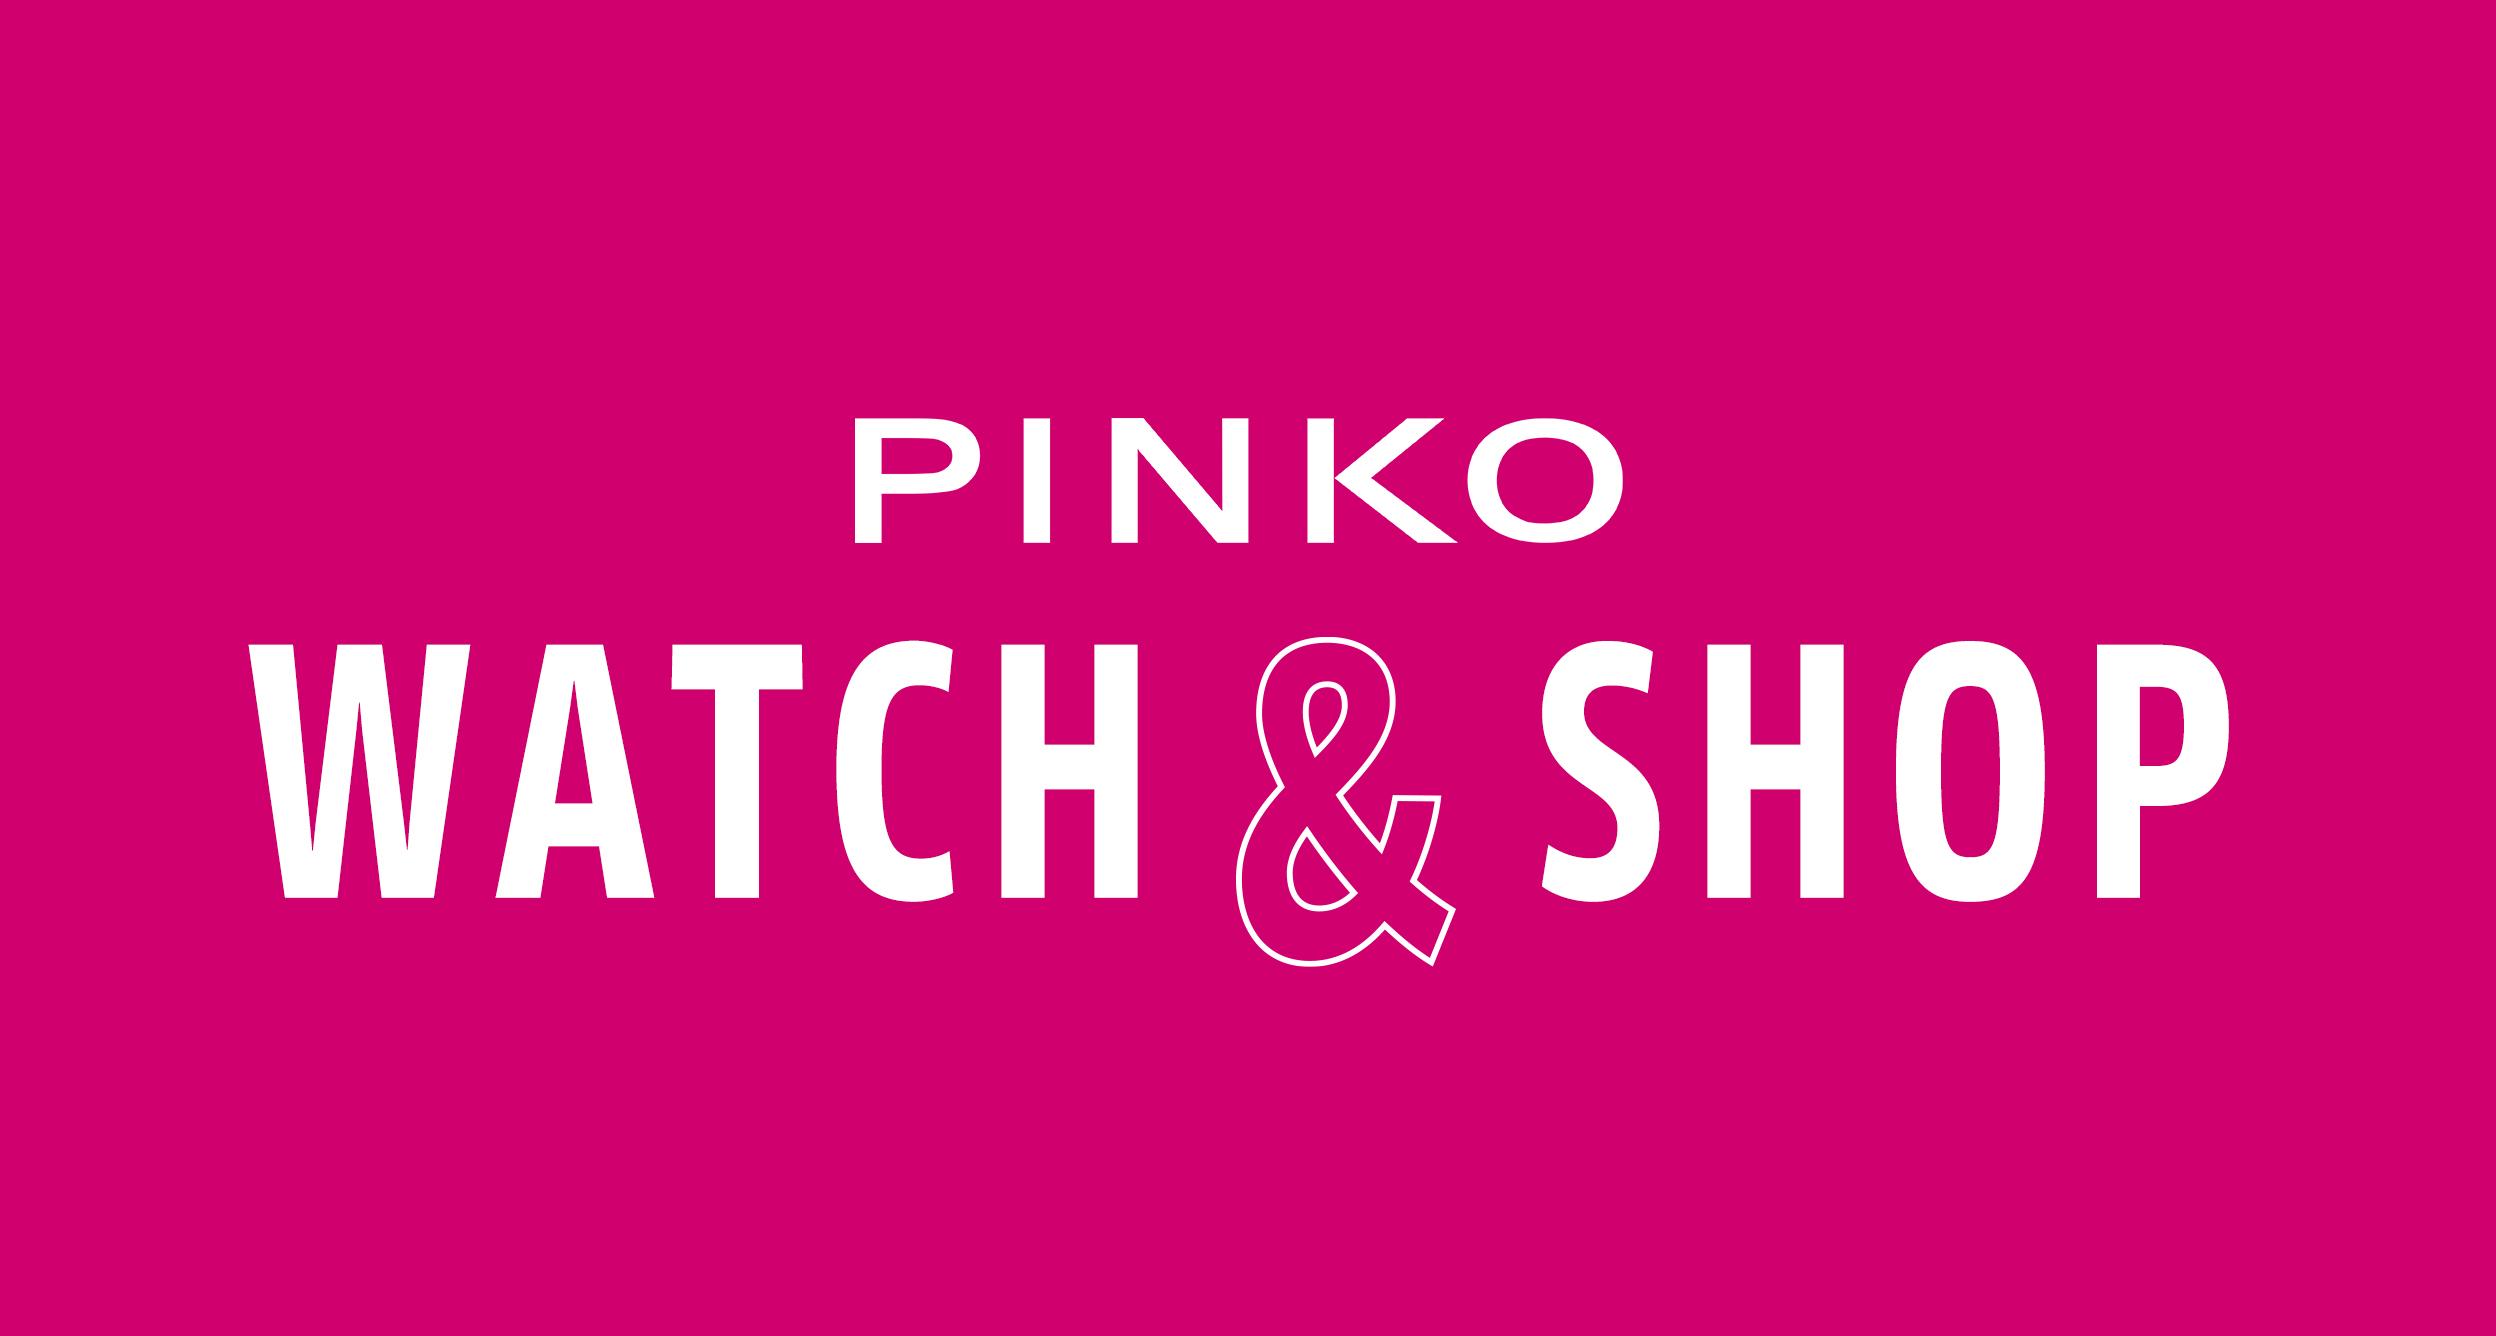 PINKO Watch & Shop